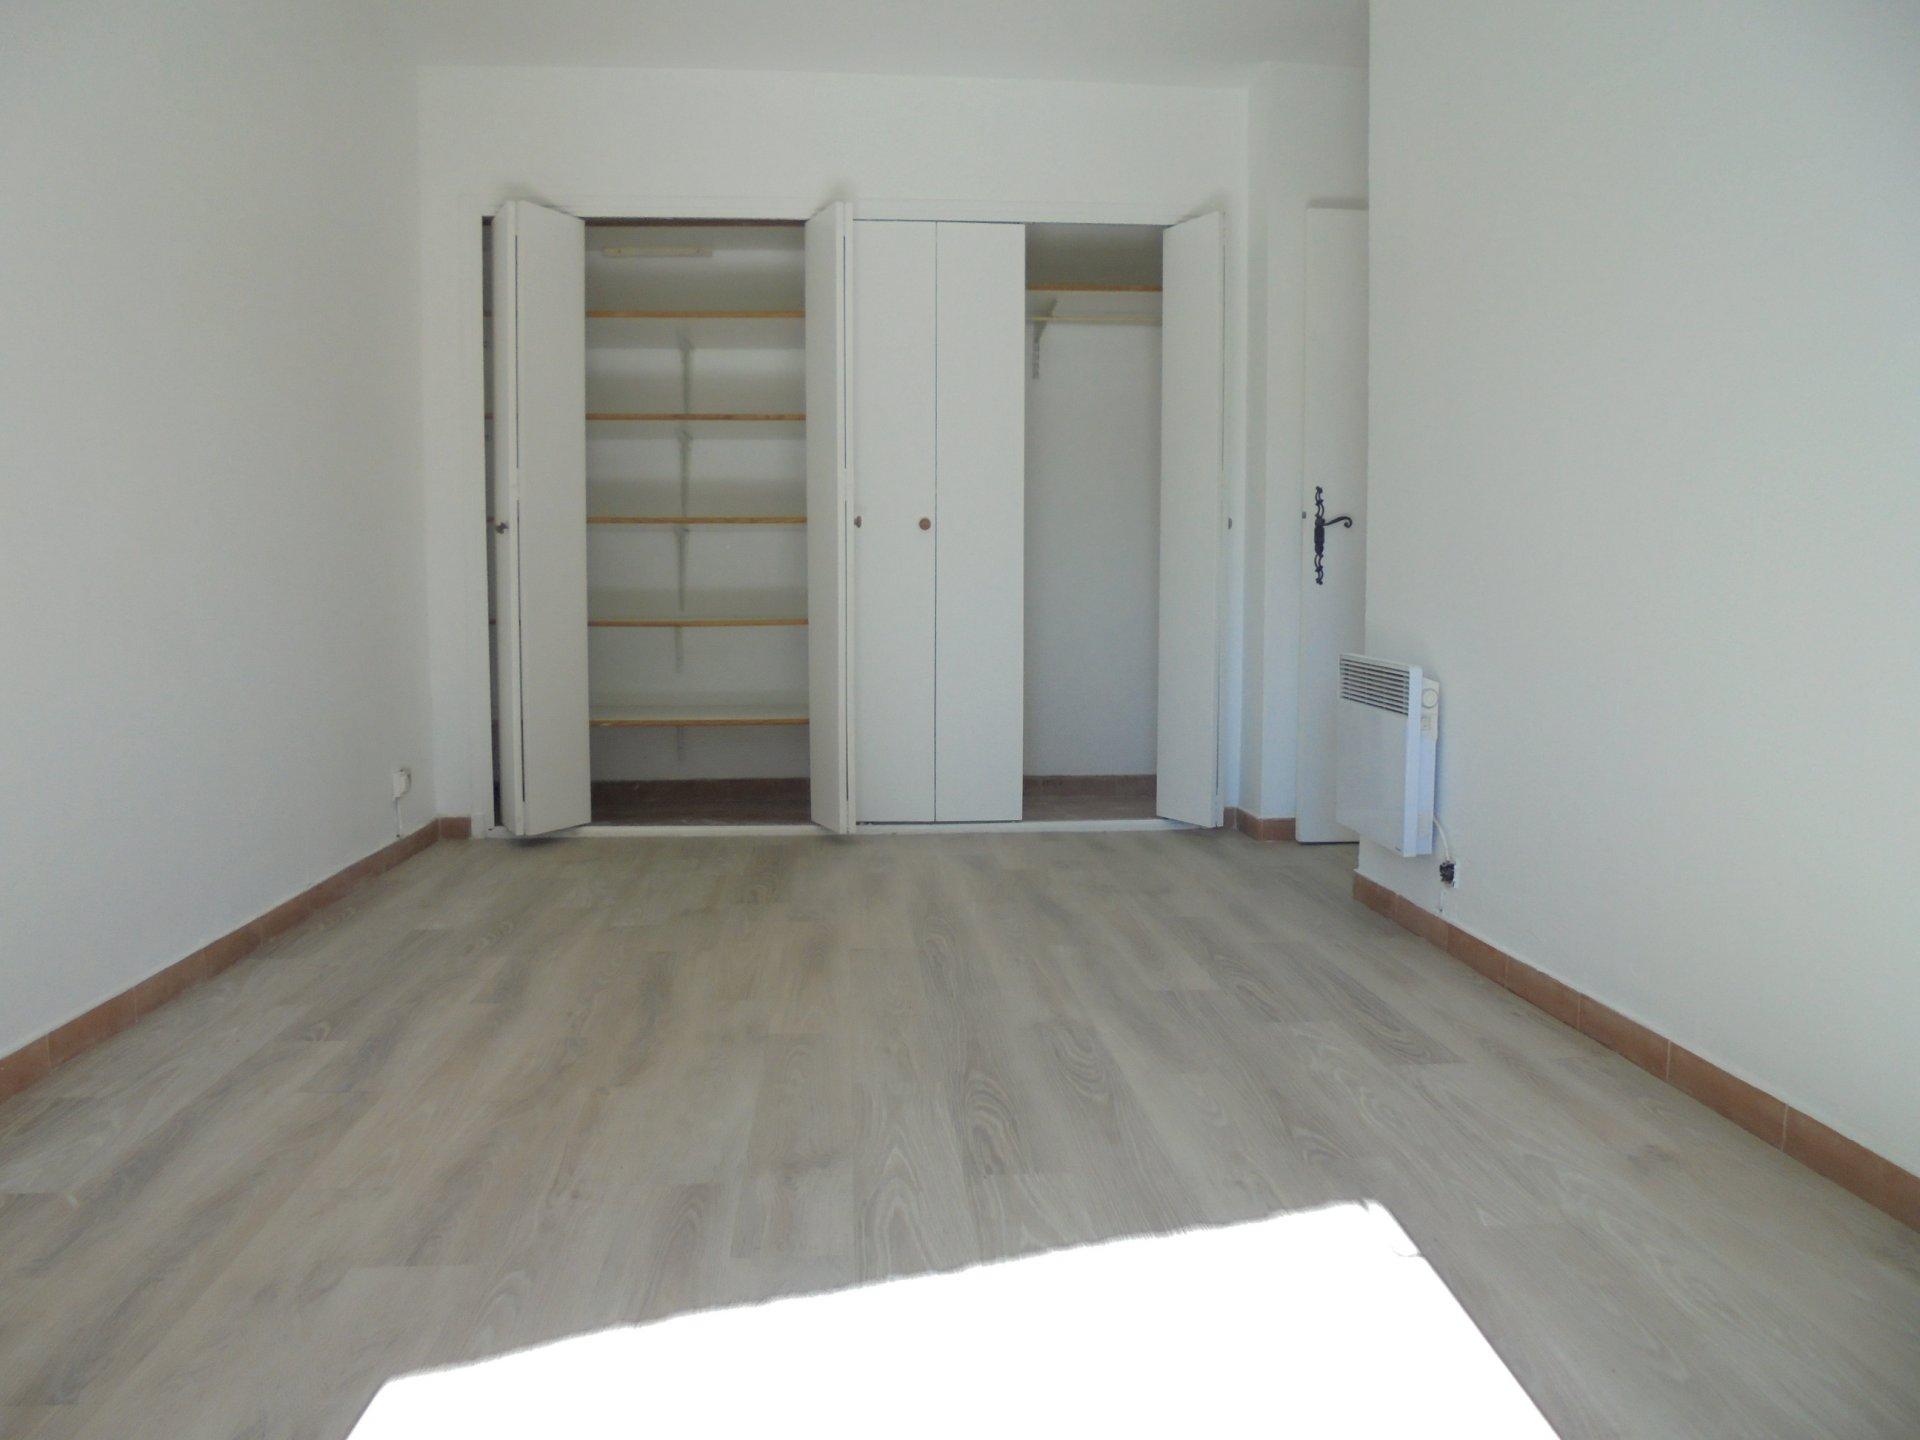 PEYMEINADE,  Appartement 2 Pièces, Vue, 1 parking